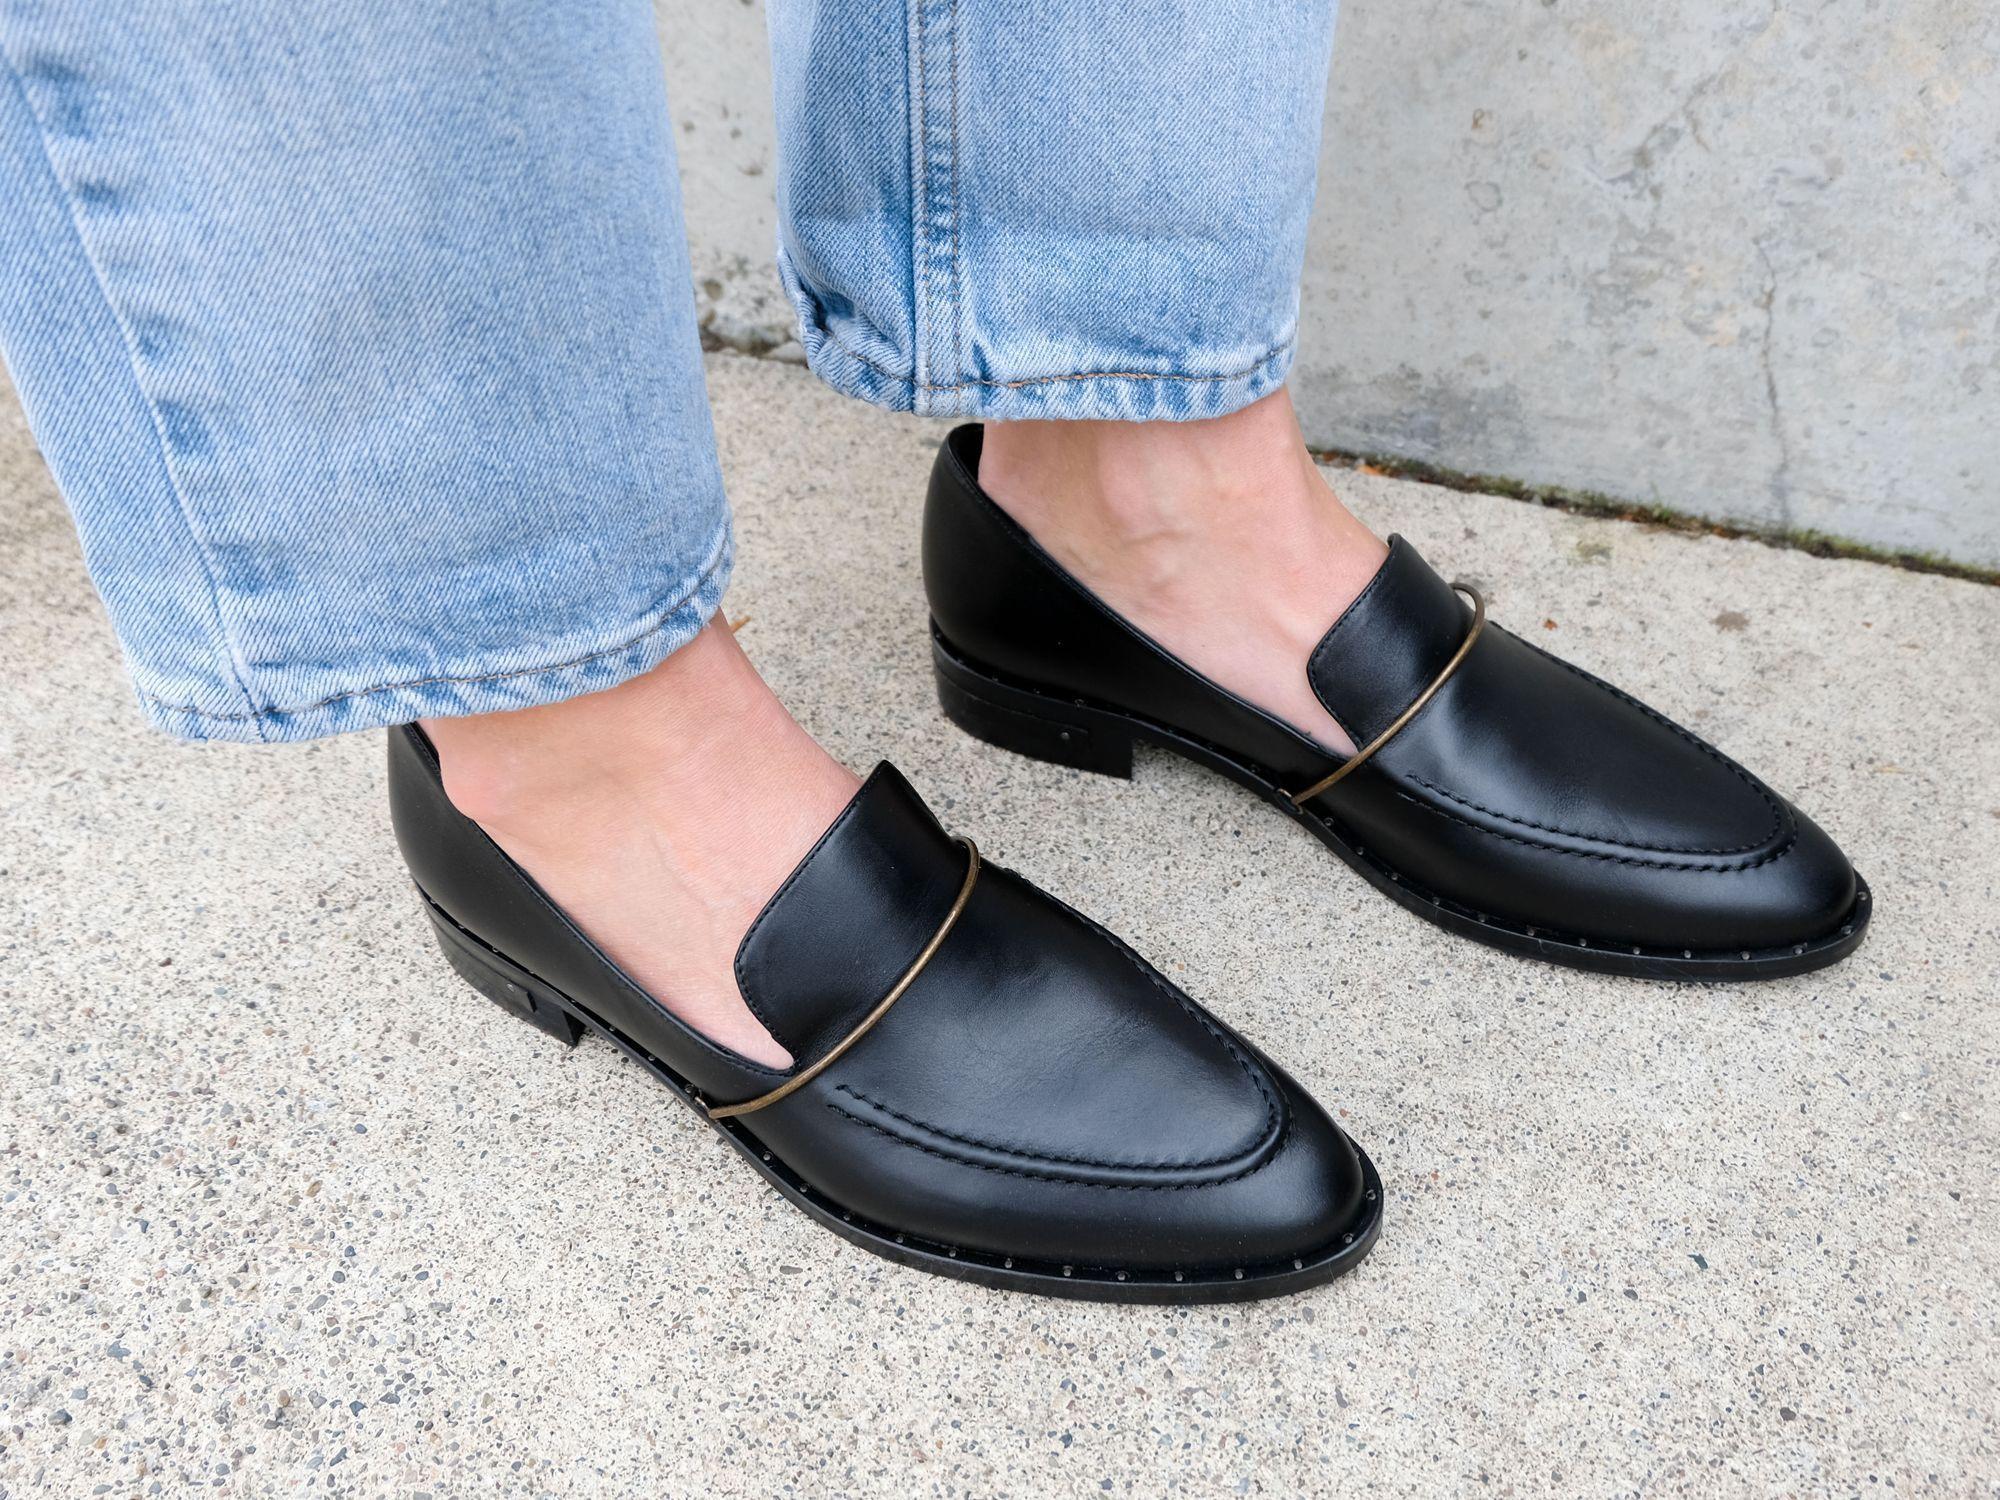 LIGHT HALO LOAFER in 2020 | Loafers men